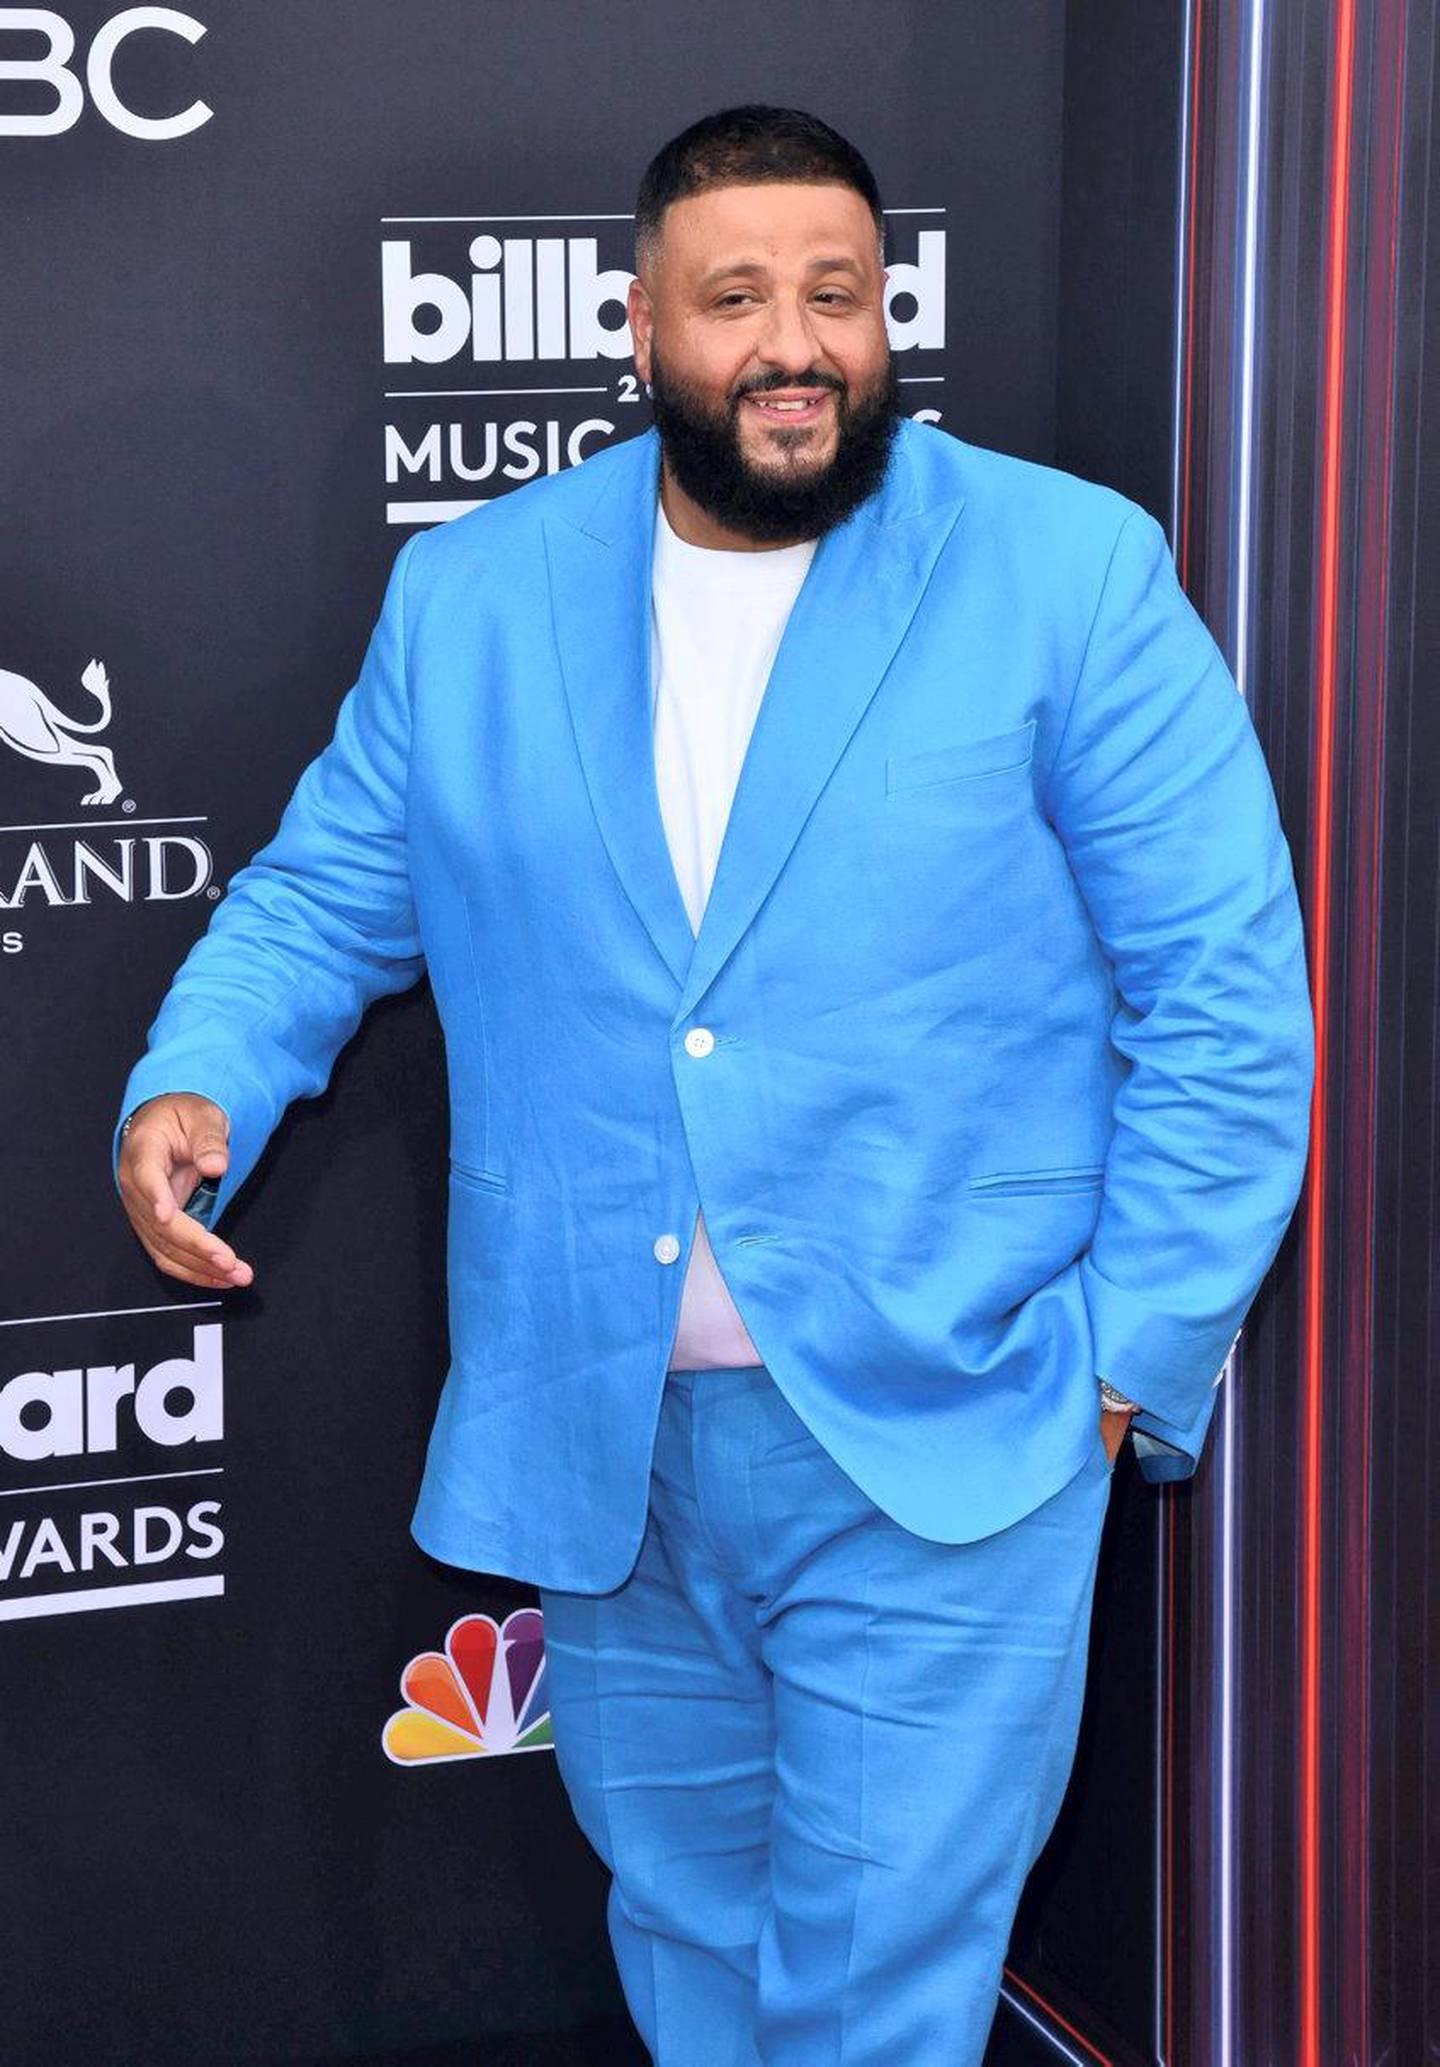 Mandatory Credit: Photo by imageSPACE/SilverHub/REX/Shutterstock (9686653ff) DJ Khaled Billboard Music Awards, Arrivals, Las Vegas, USA - 20 May 2018